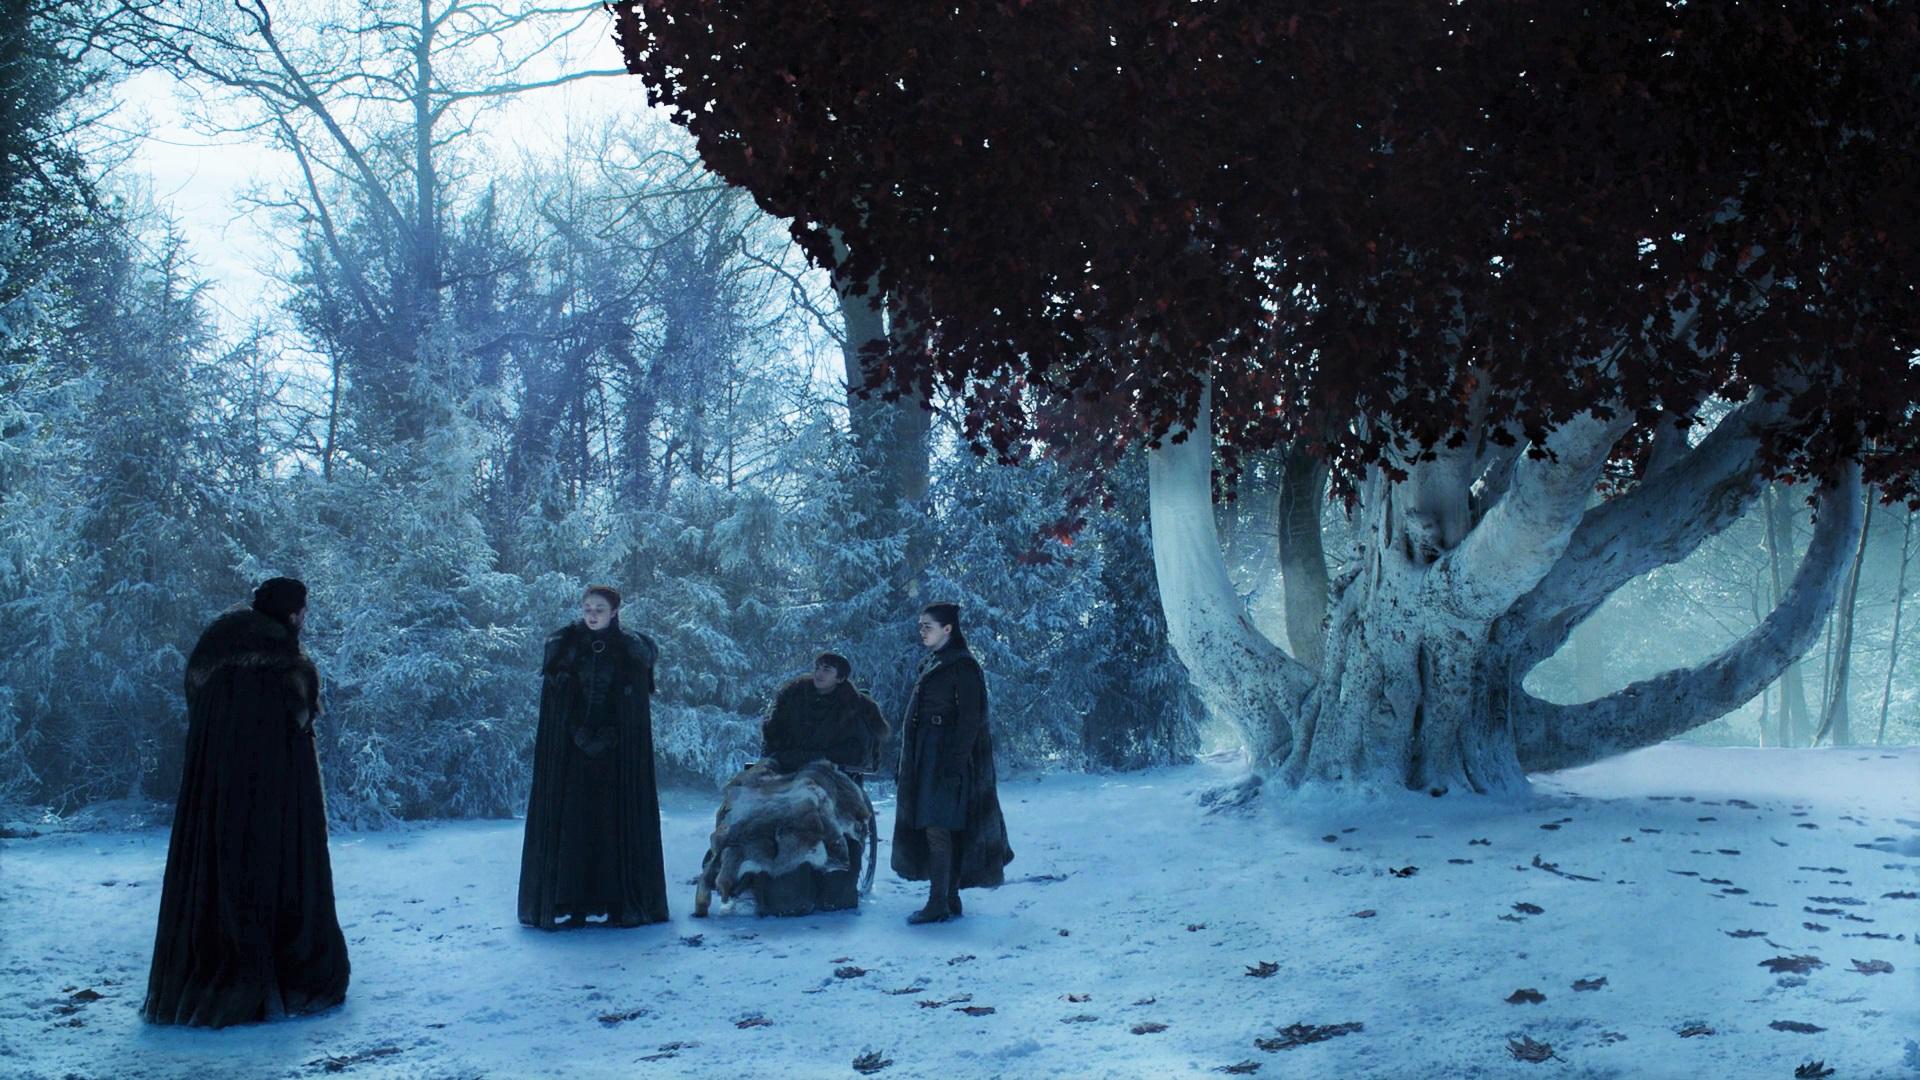 Jon Snow Sansa Stark Bran Arya Godswood Weirwood Season 8 804